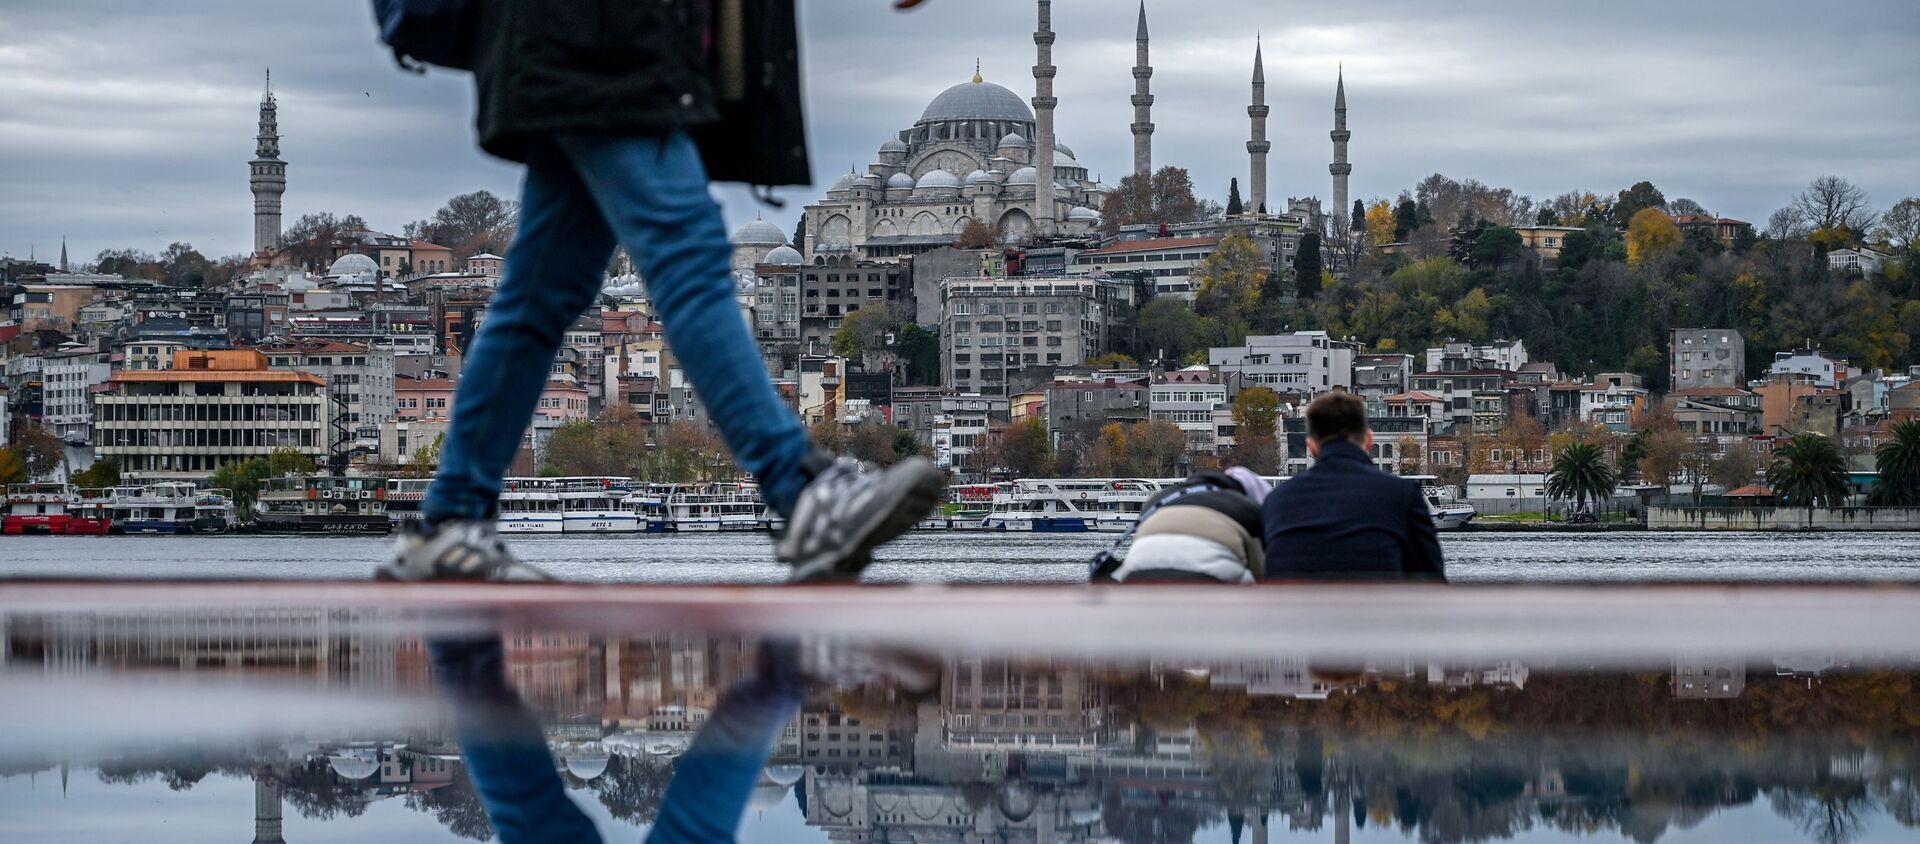 Вид на Стамбул, фото из архива - Sputnik Азербайджан, 1920, 18.02.2021